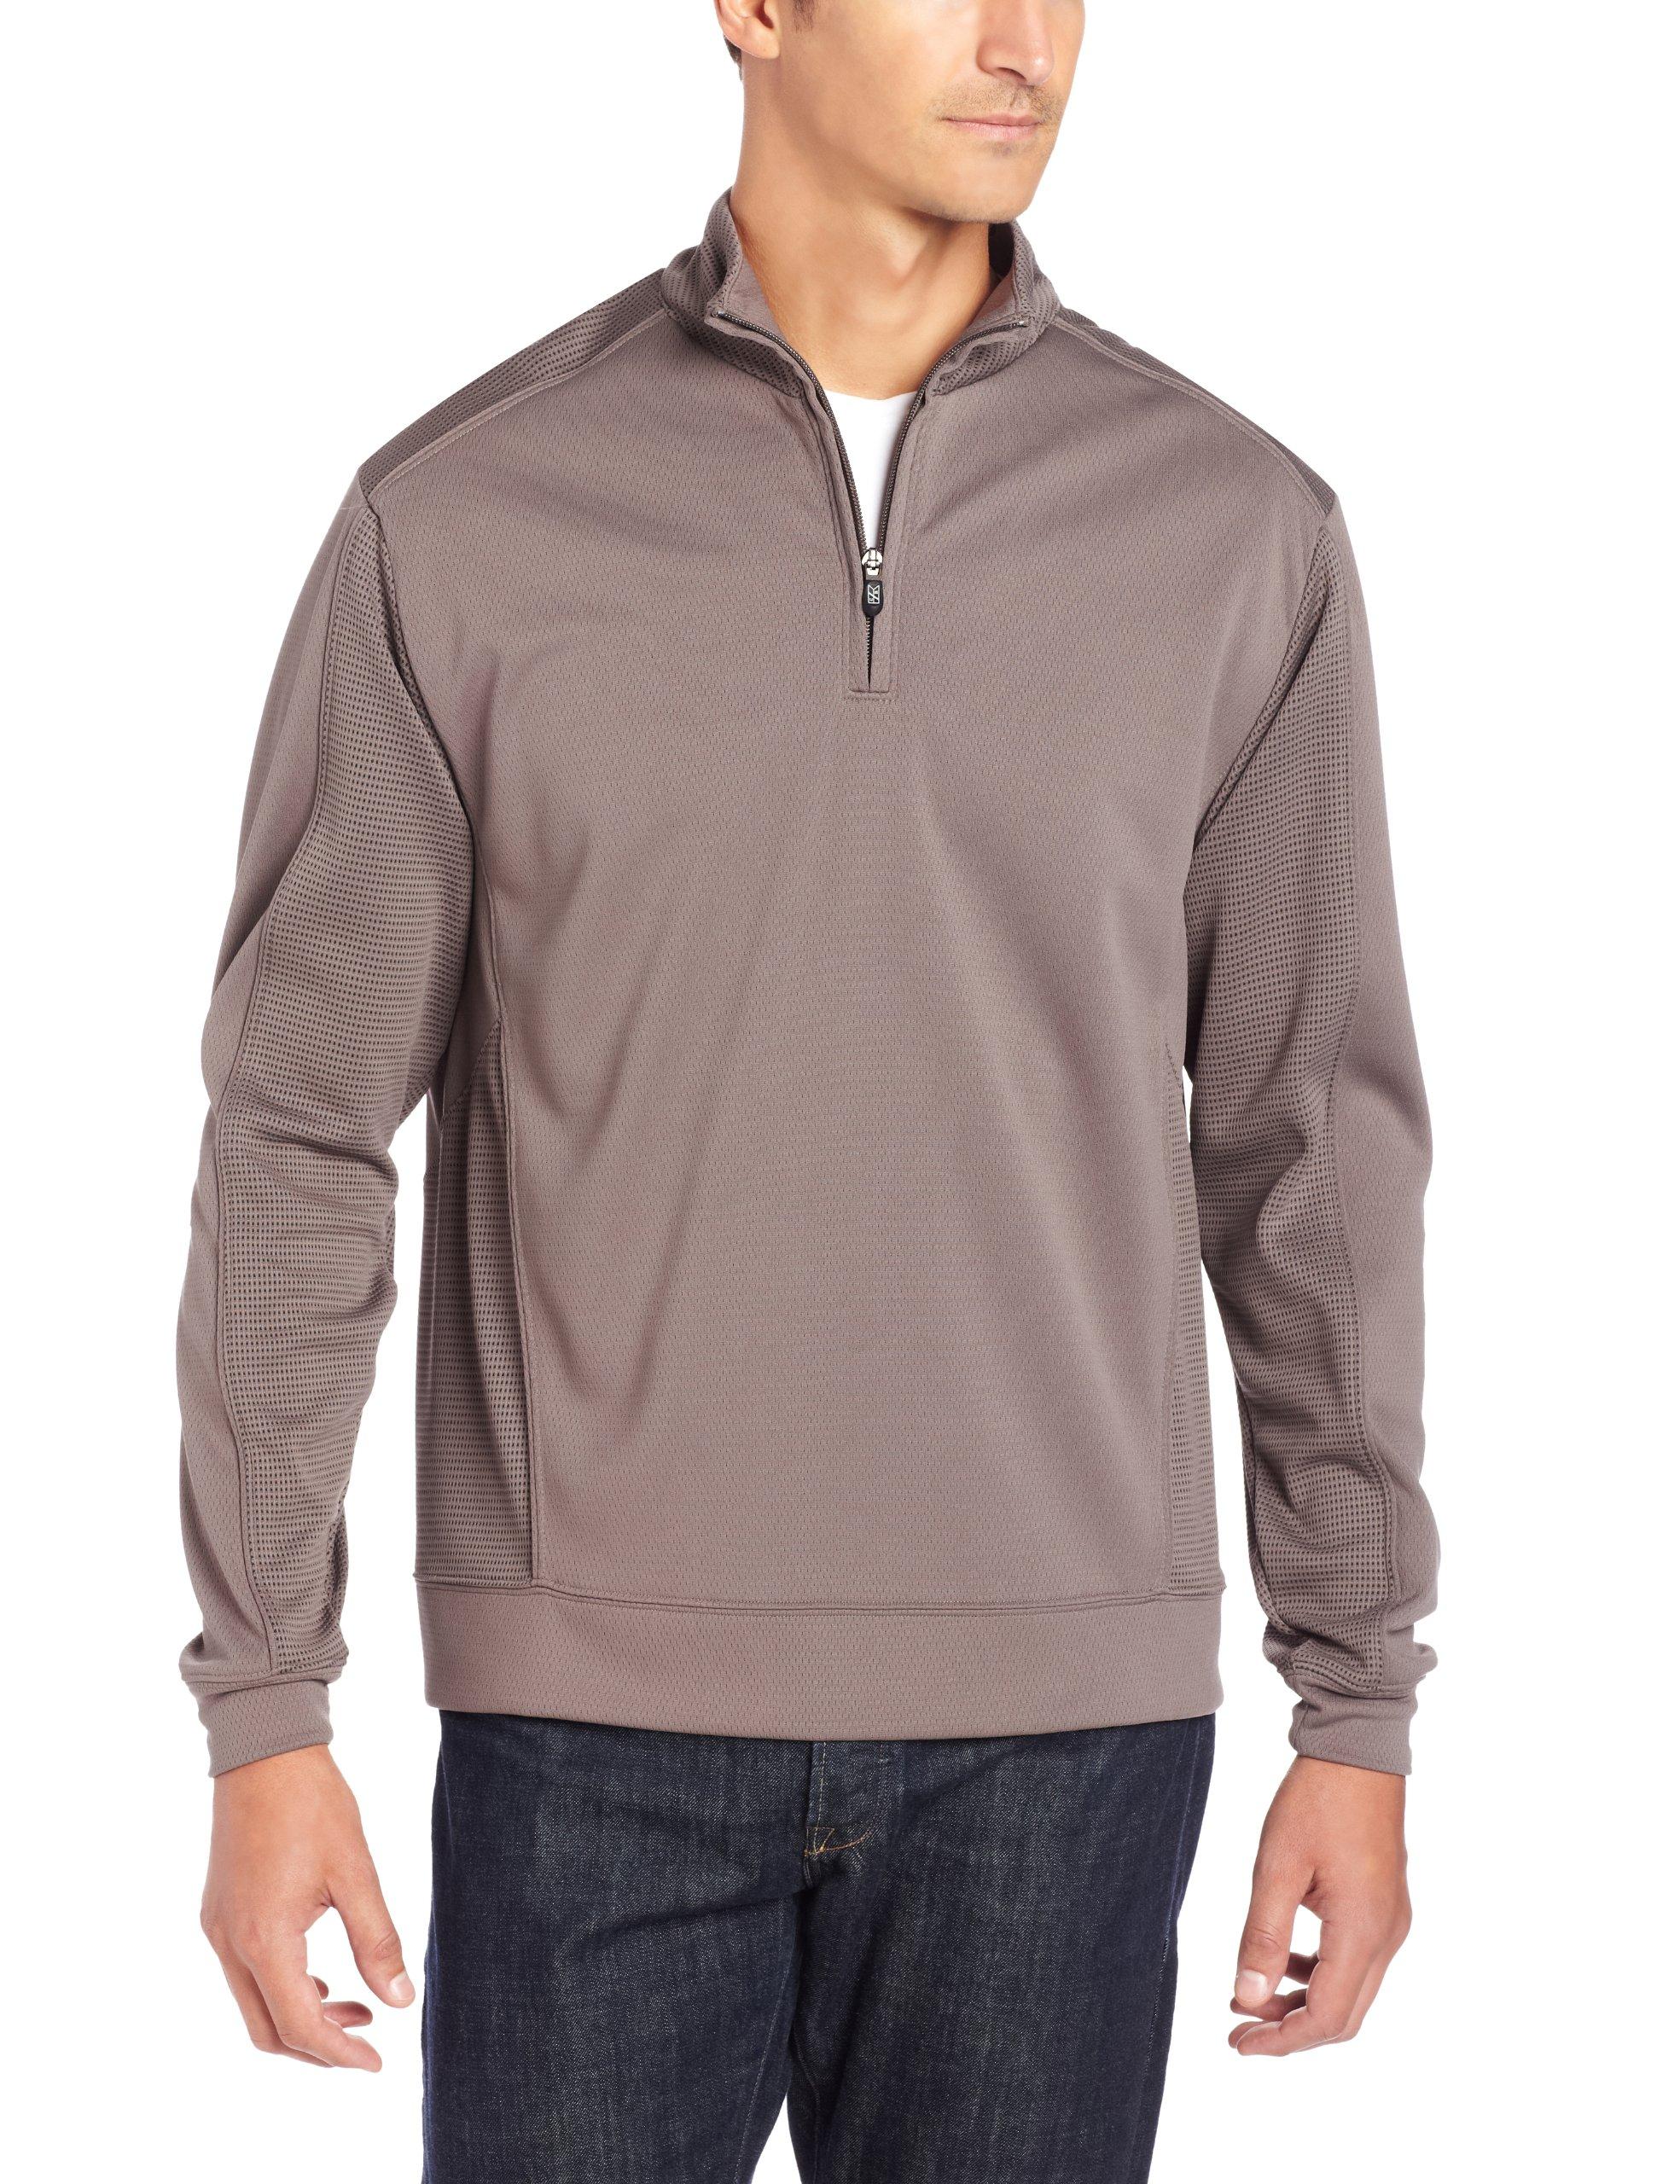 Cutter & Buck Men's CB Drytec Edge Half Zip Sweatshirt, Circuit, 3X-Large